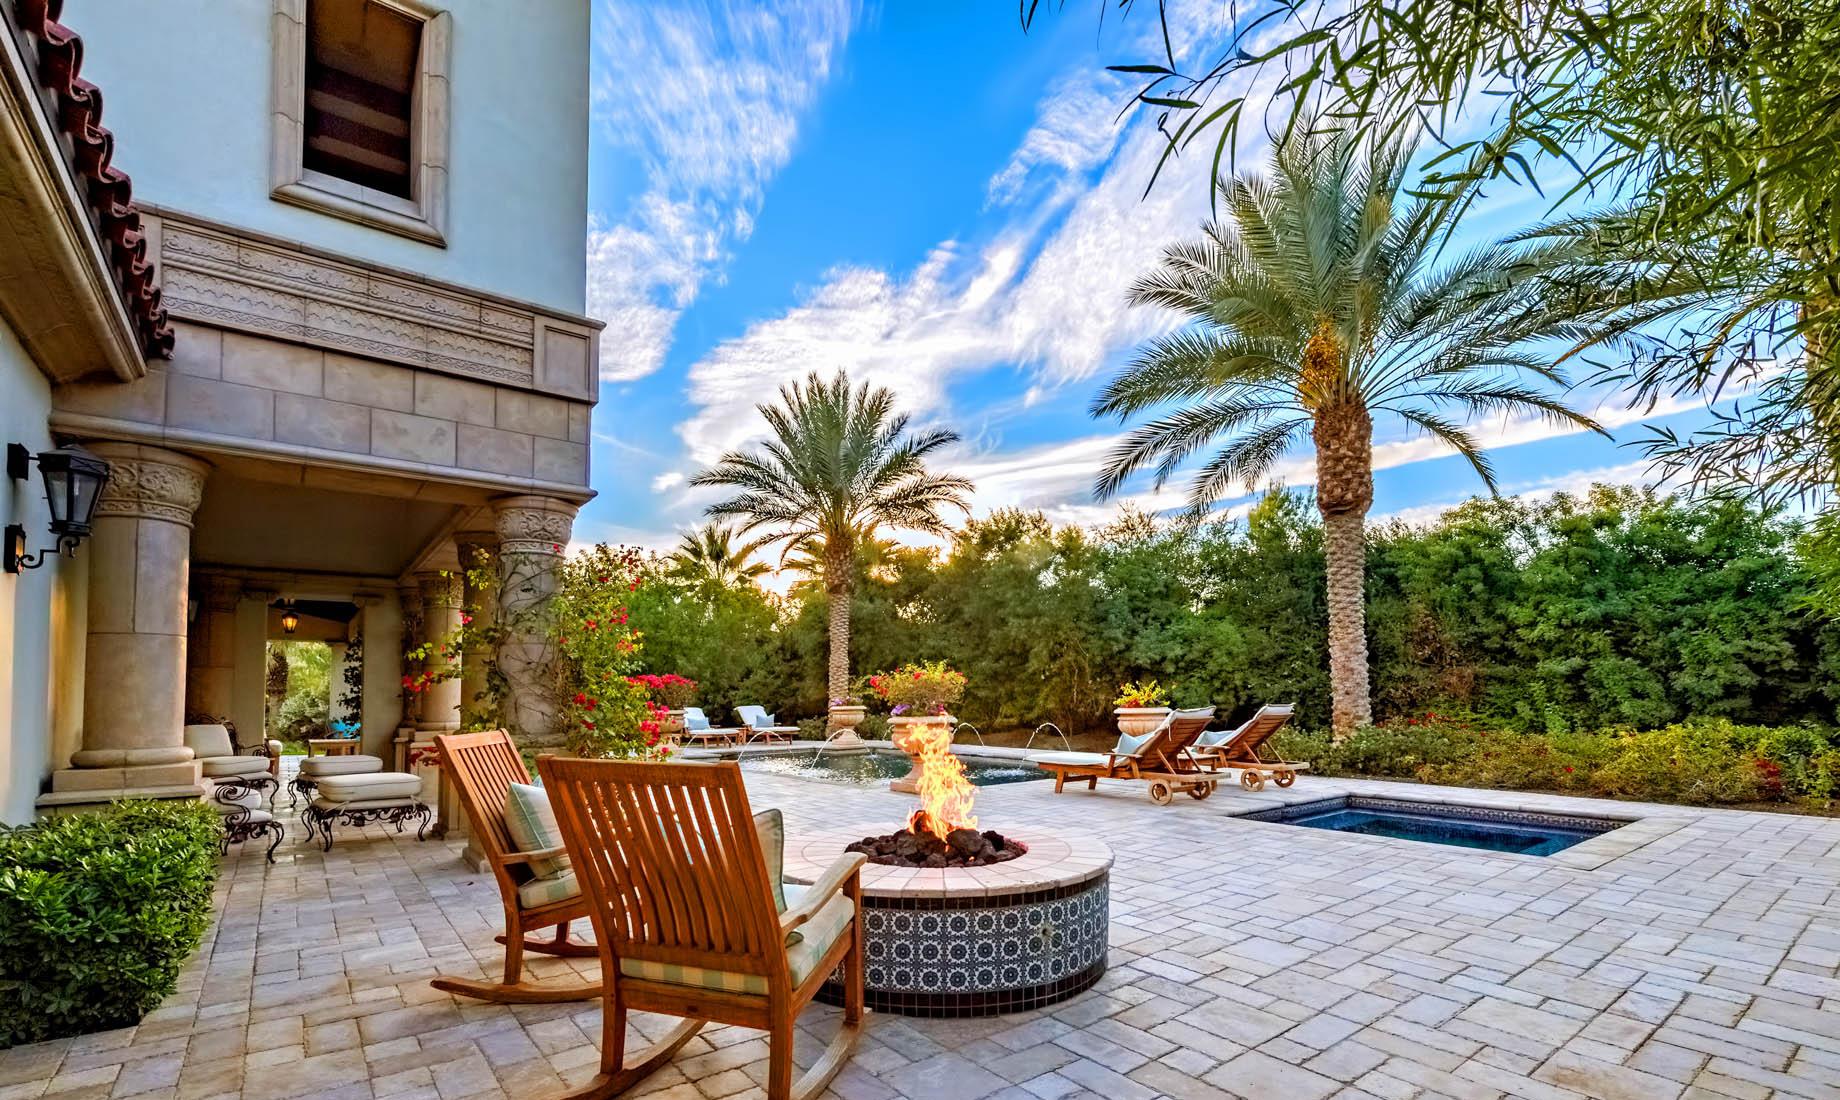 Sylvester Stallone Residence - Humboldt Blvd, La Quinta, CA, USA